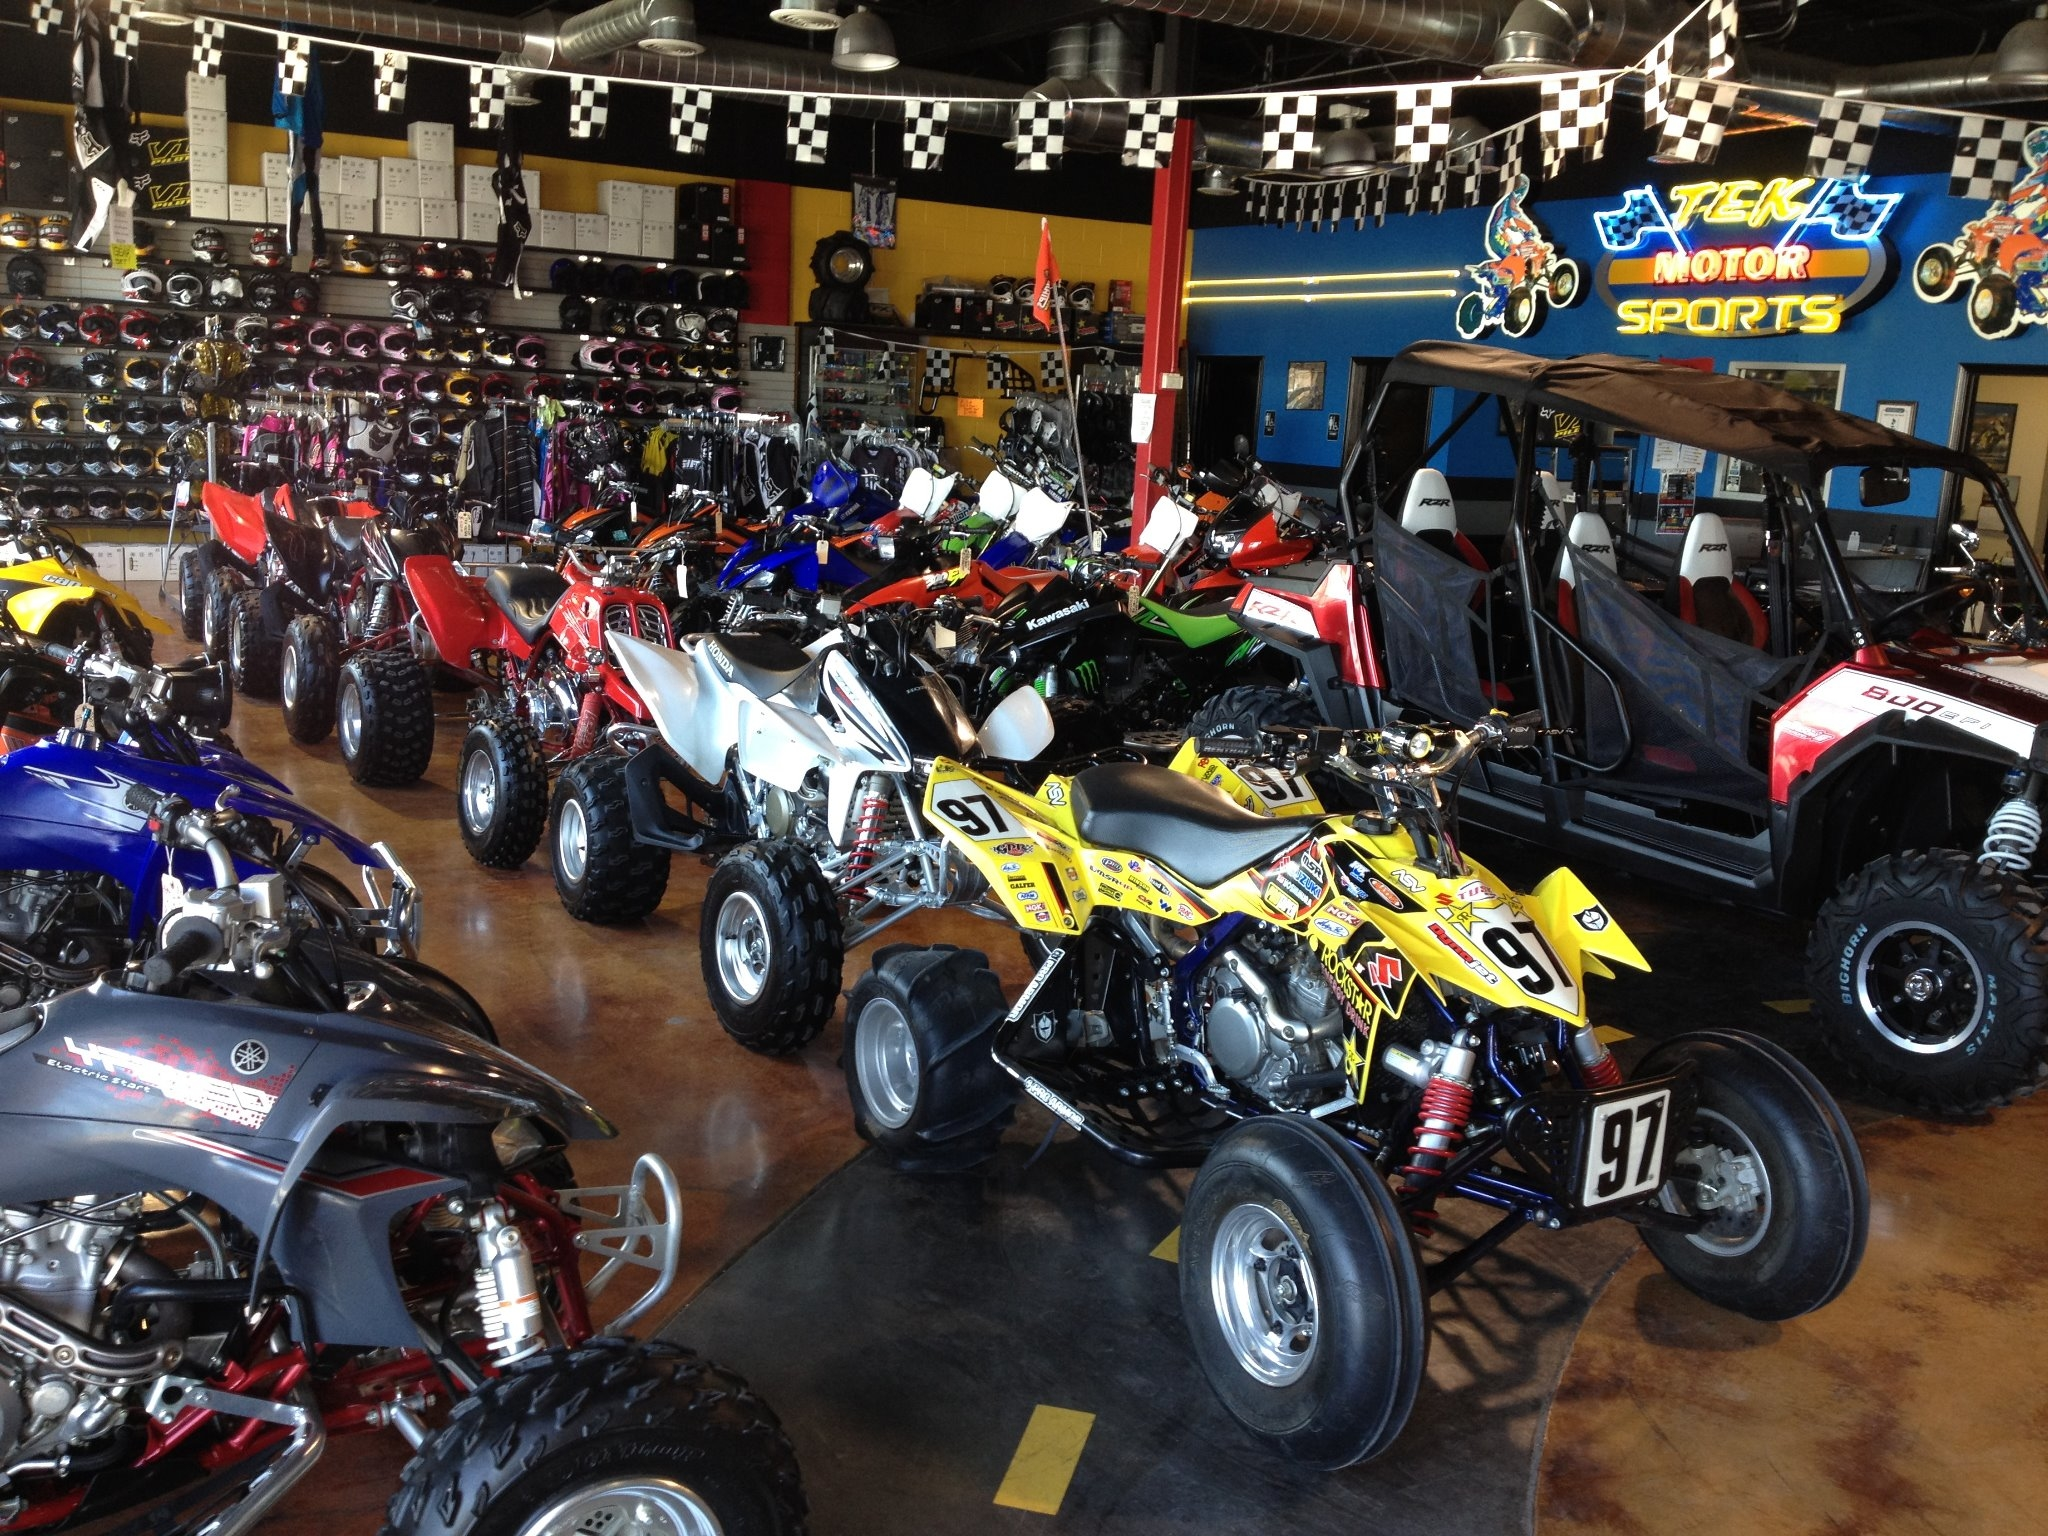 Tek motor sports inc en el paso tx negocios for Texas department of motor vehicles el paso tx